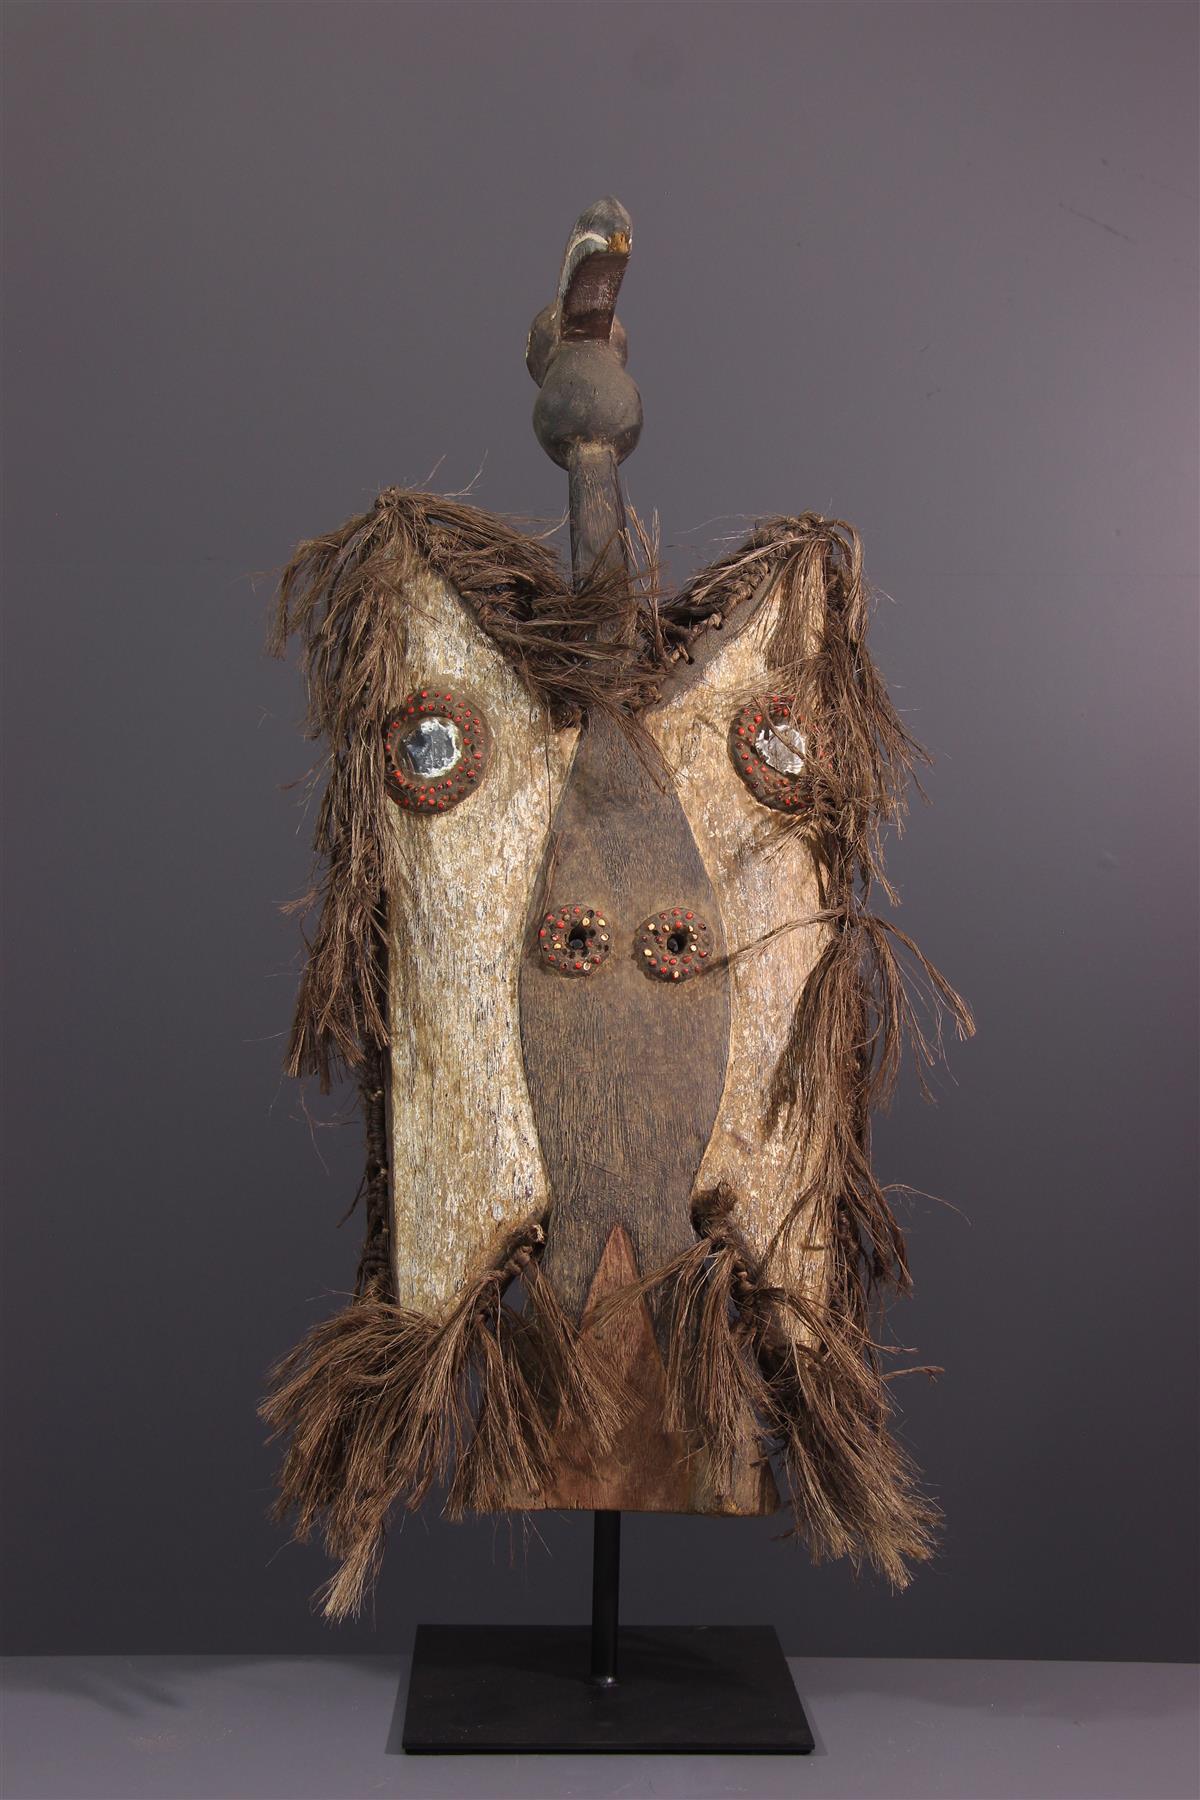 Tussian Mask - African art